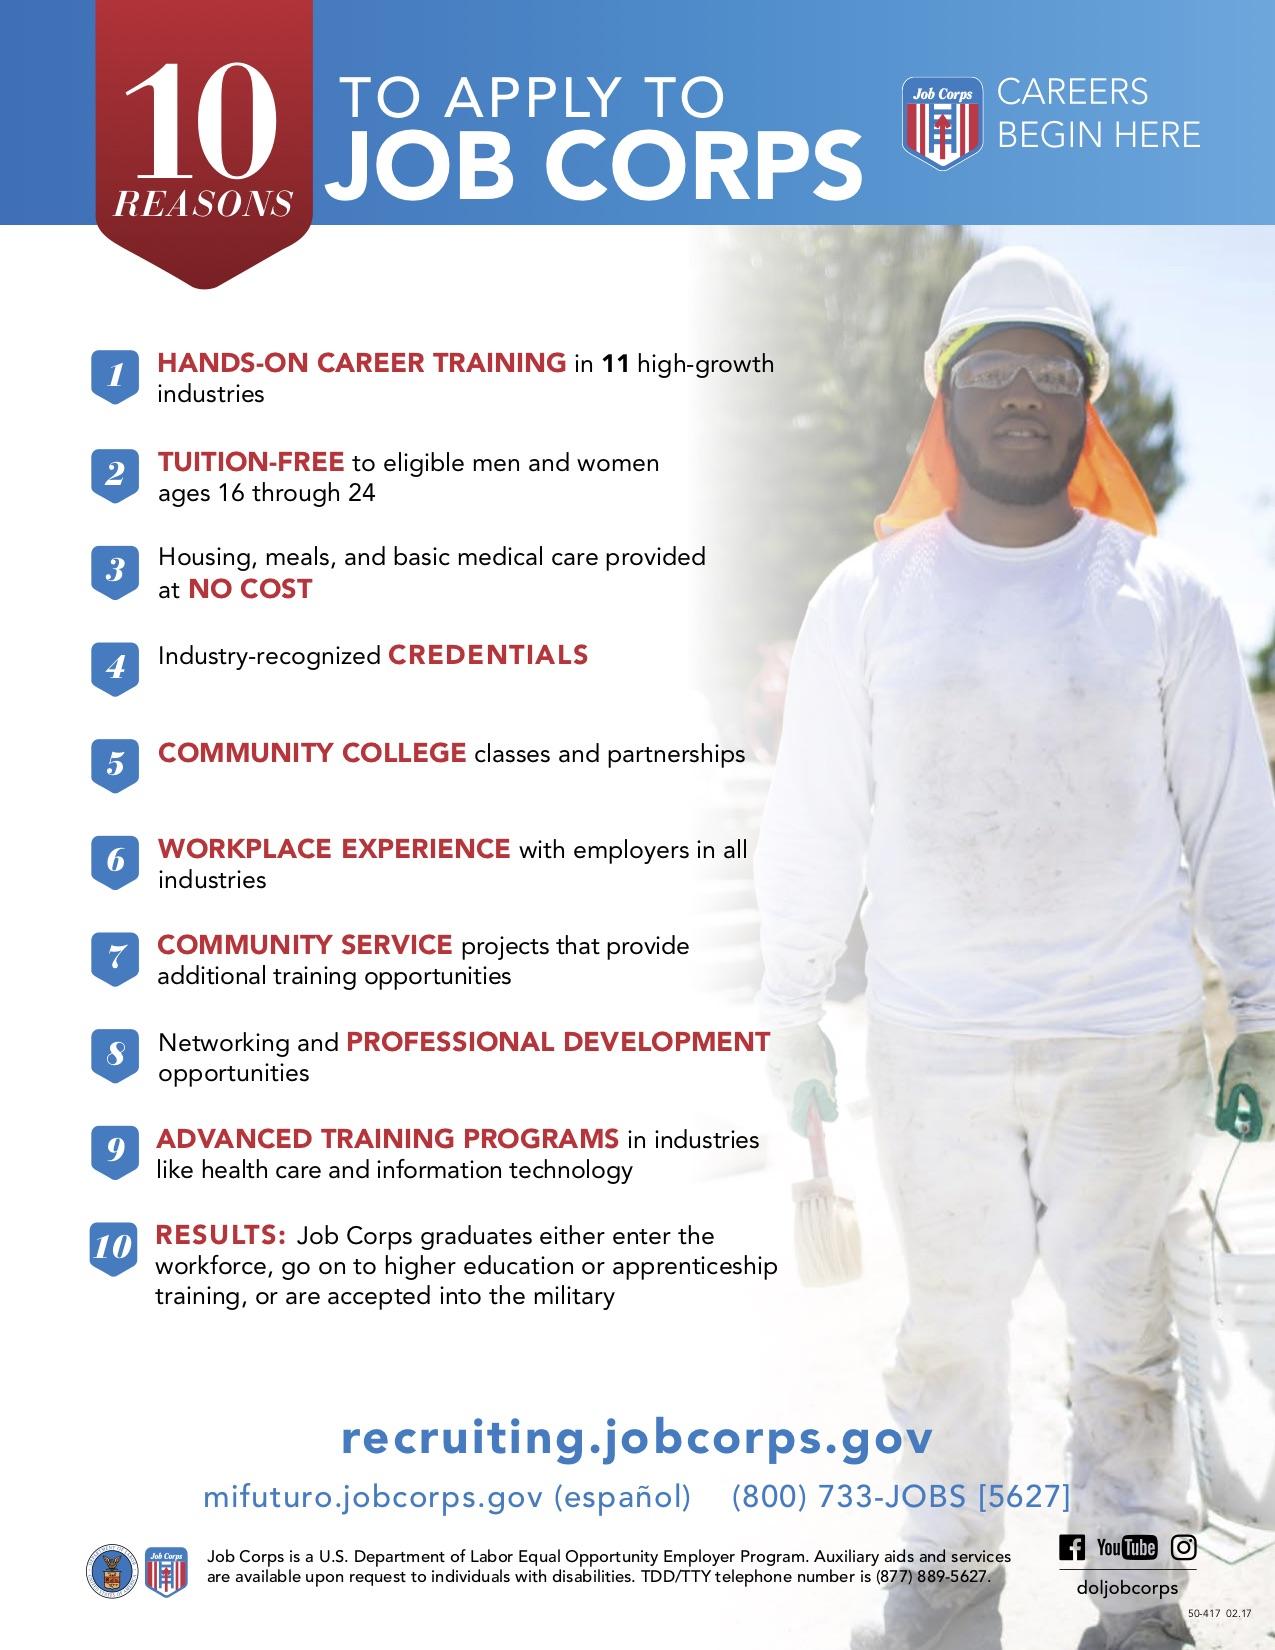 10 Reasons to Apply to Job Corps.jpg